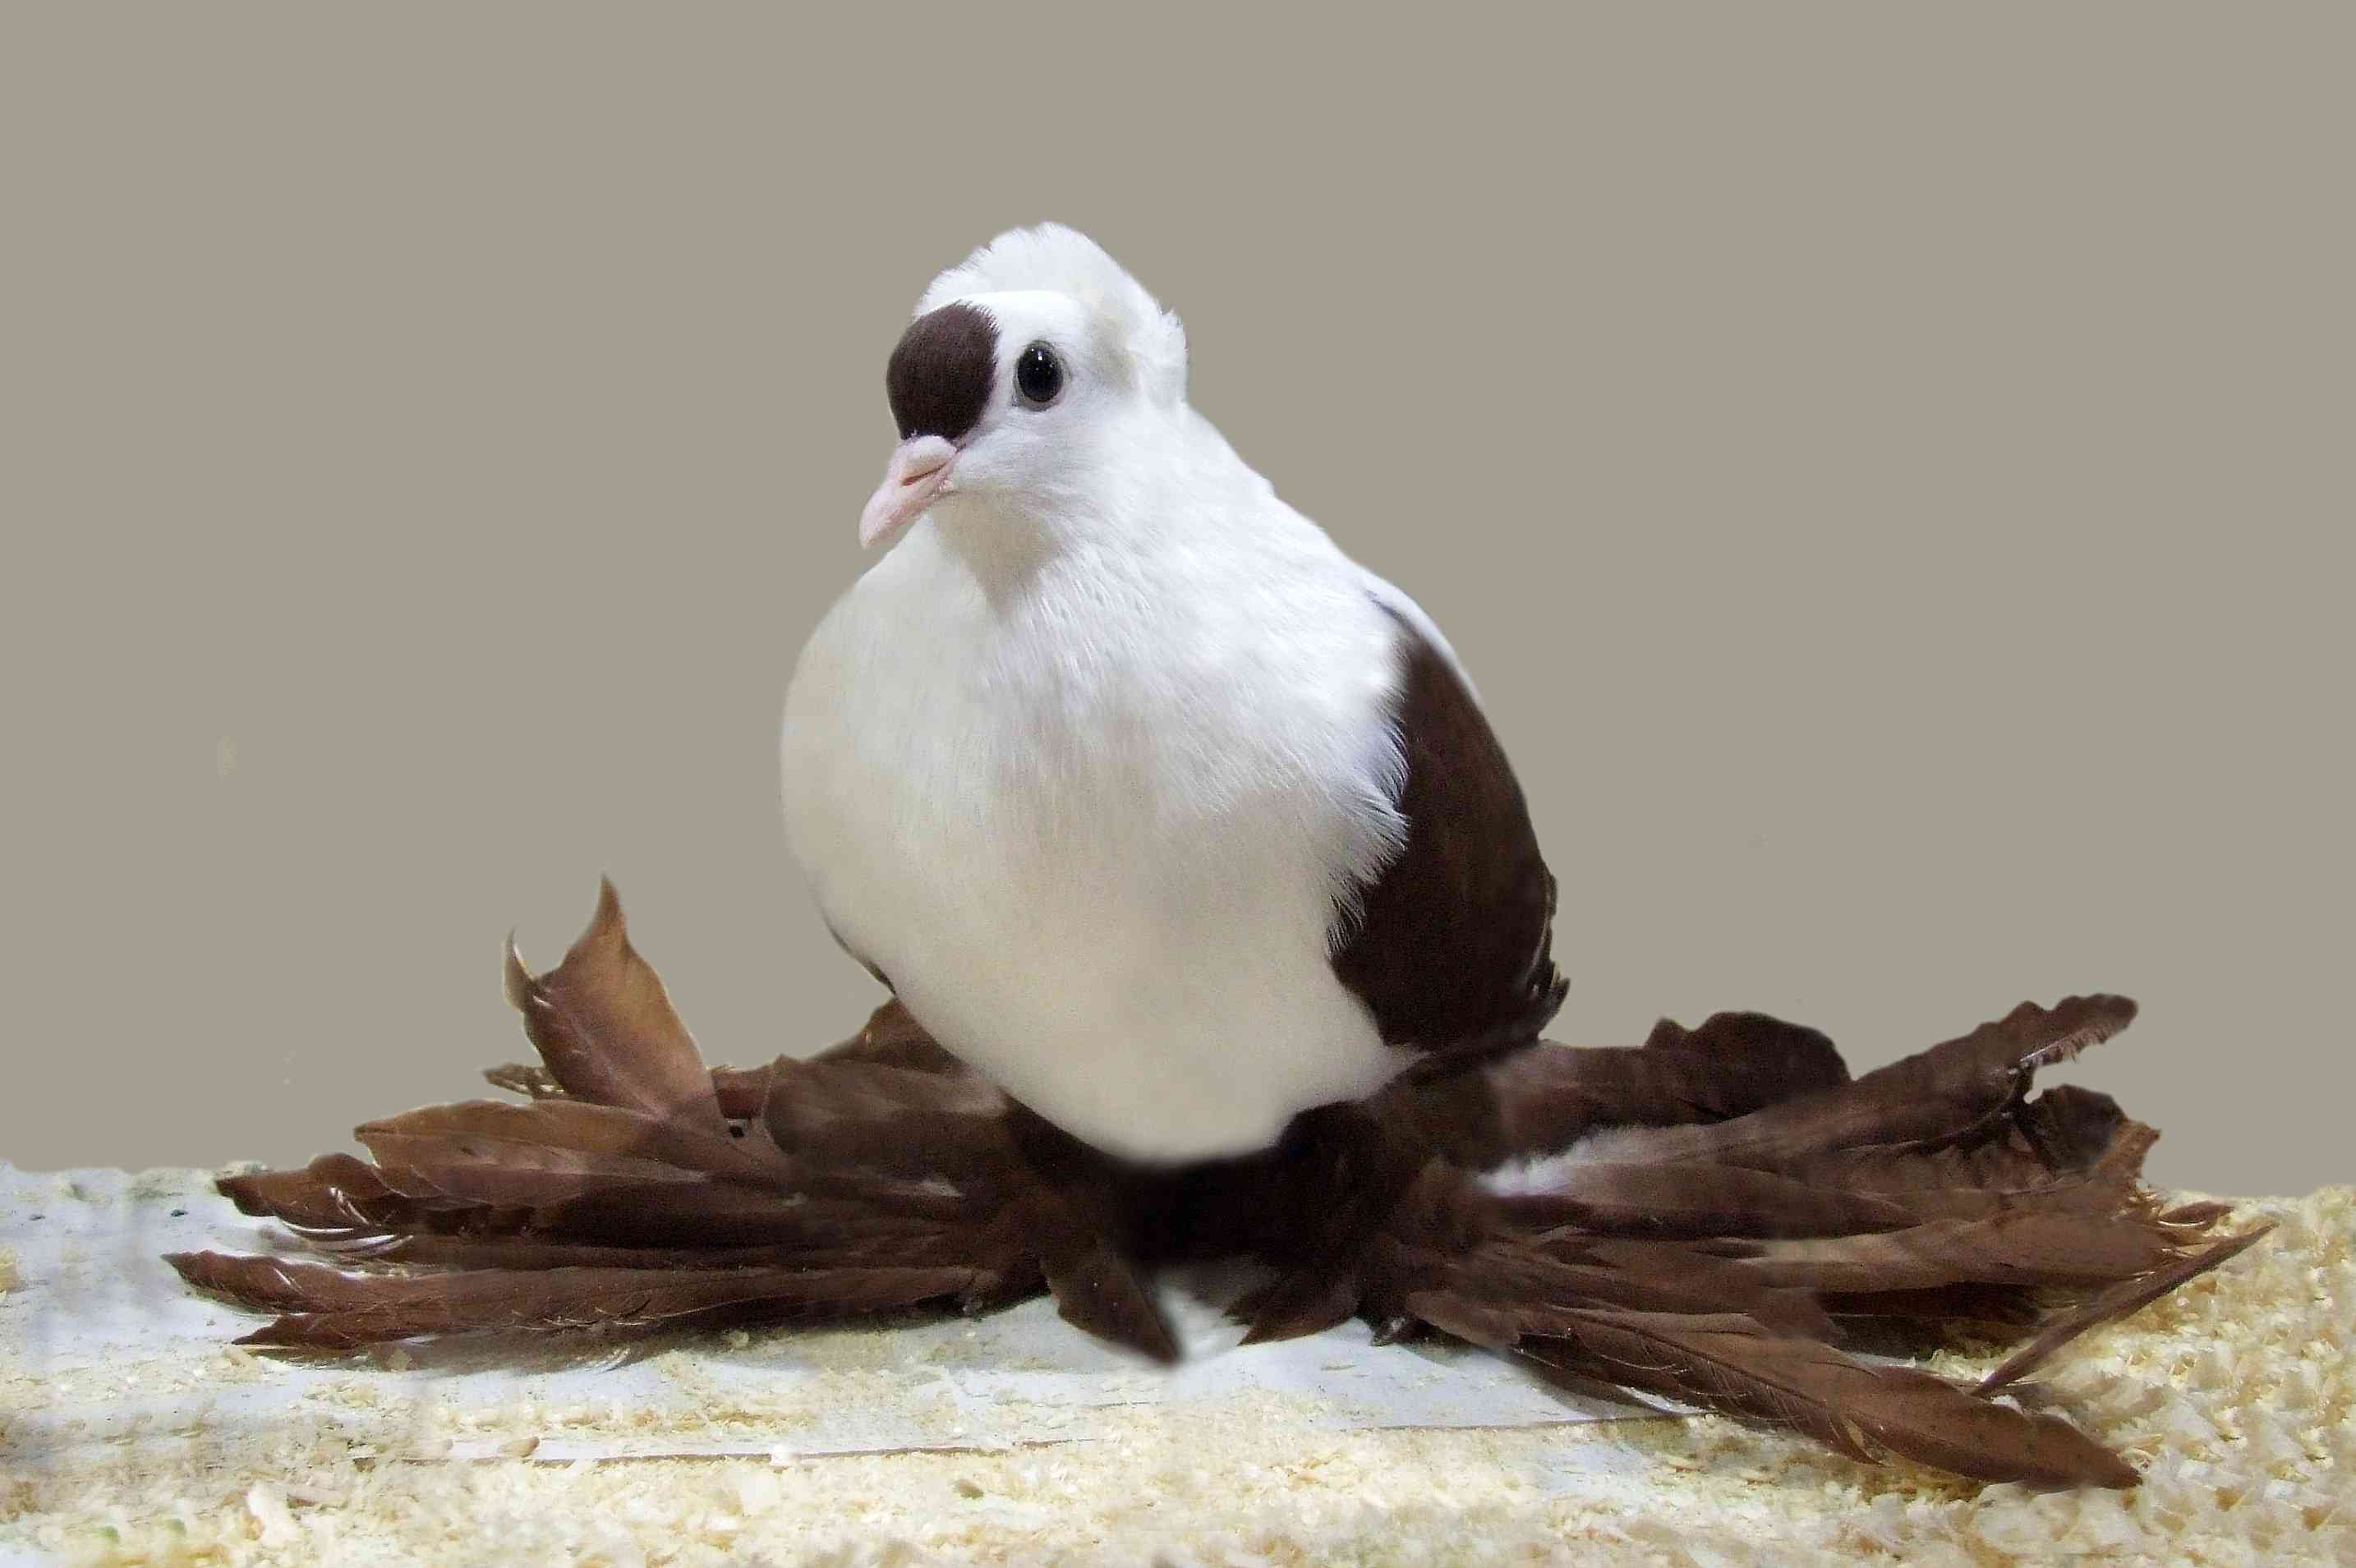 Saxon fairy swallow pigeon standing on sawdust